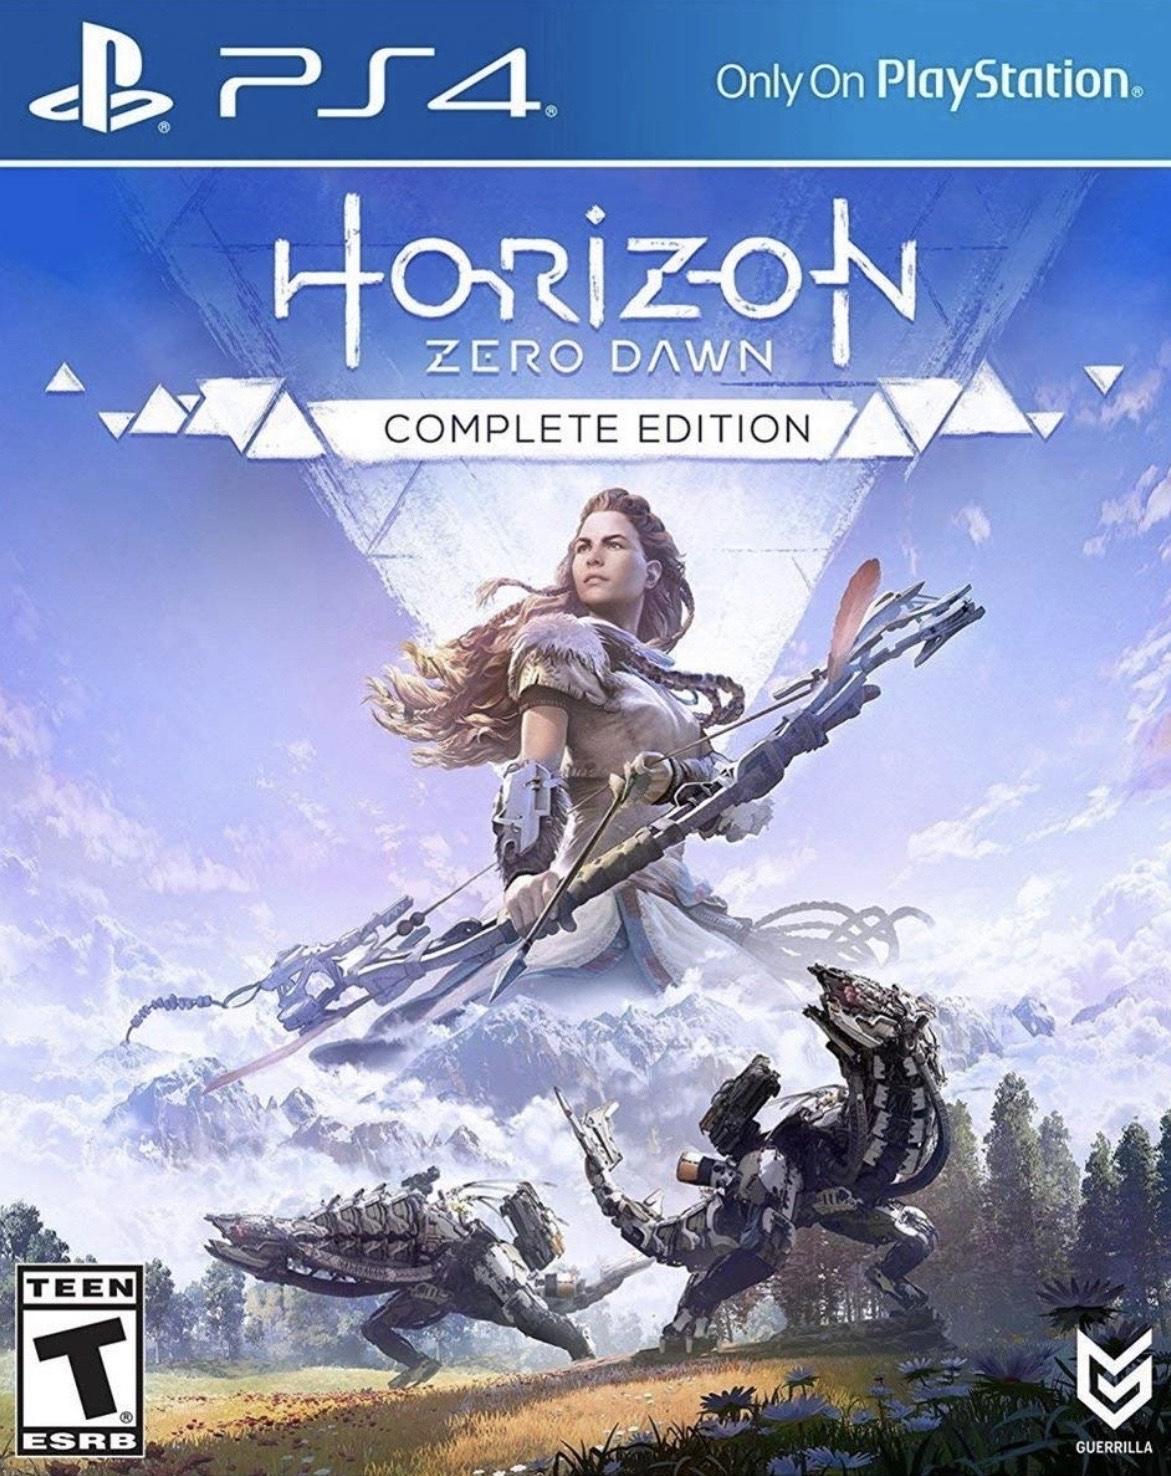 Horizon Zero Dawn Complete Edition (PS4) £12.99 @ Playstation PSN